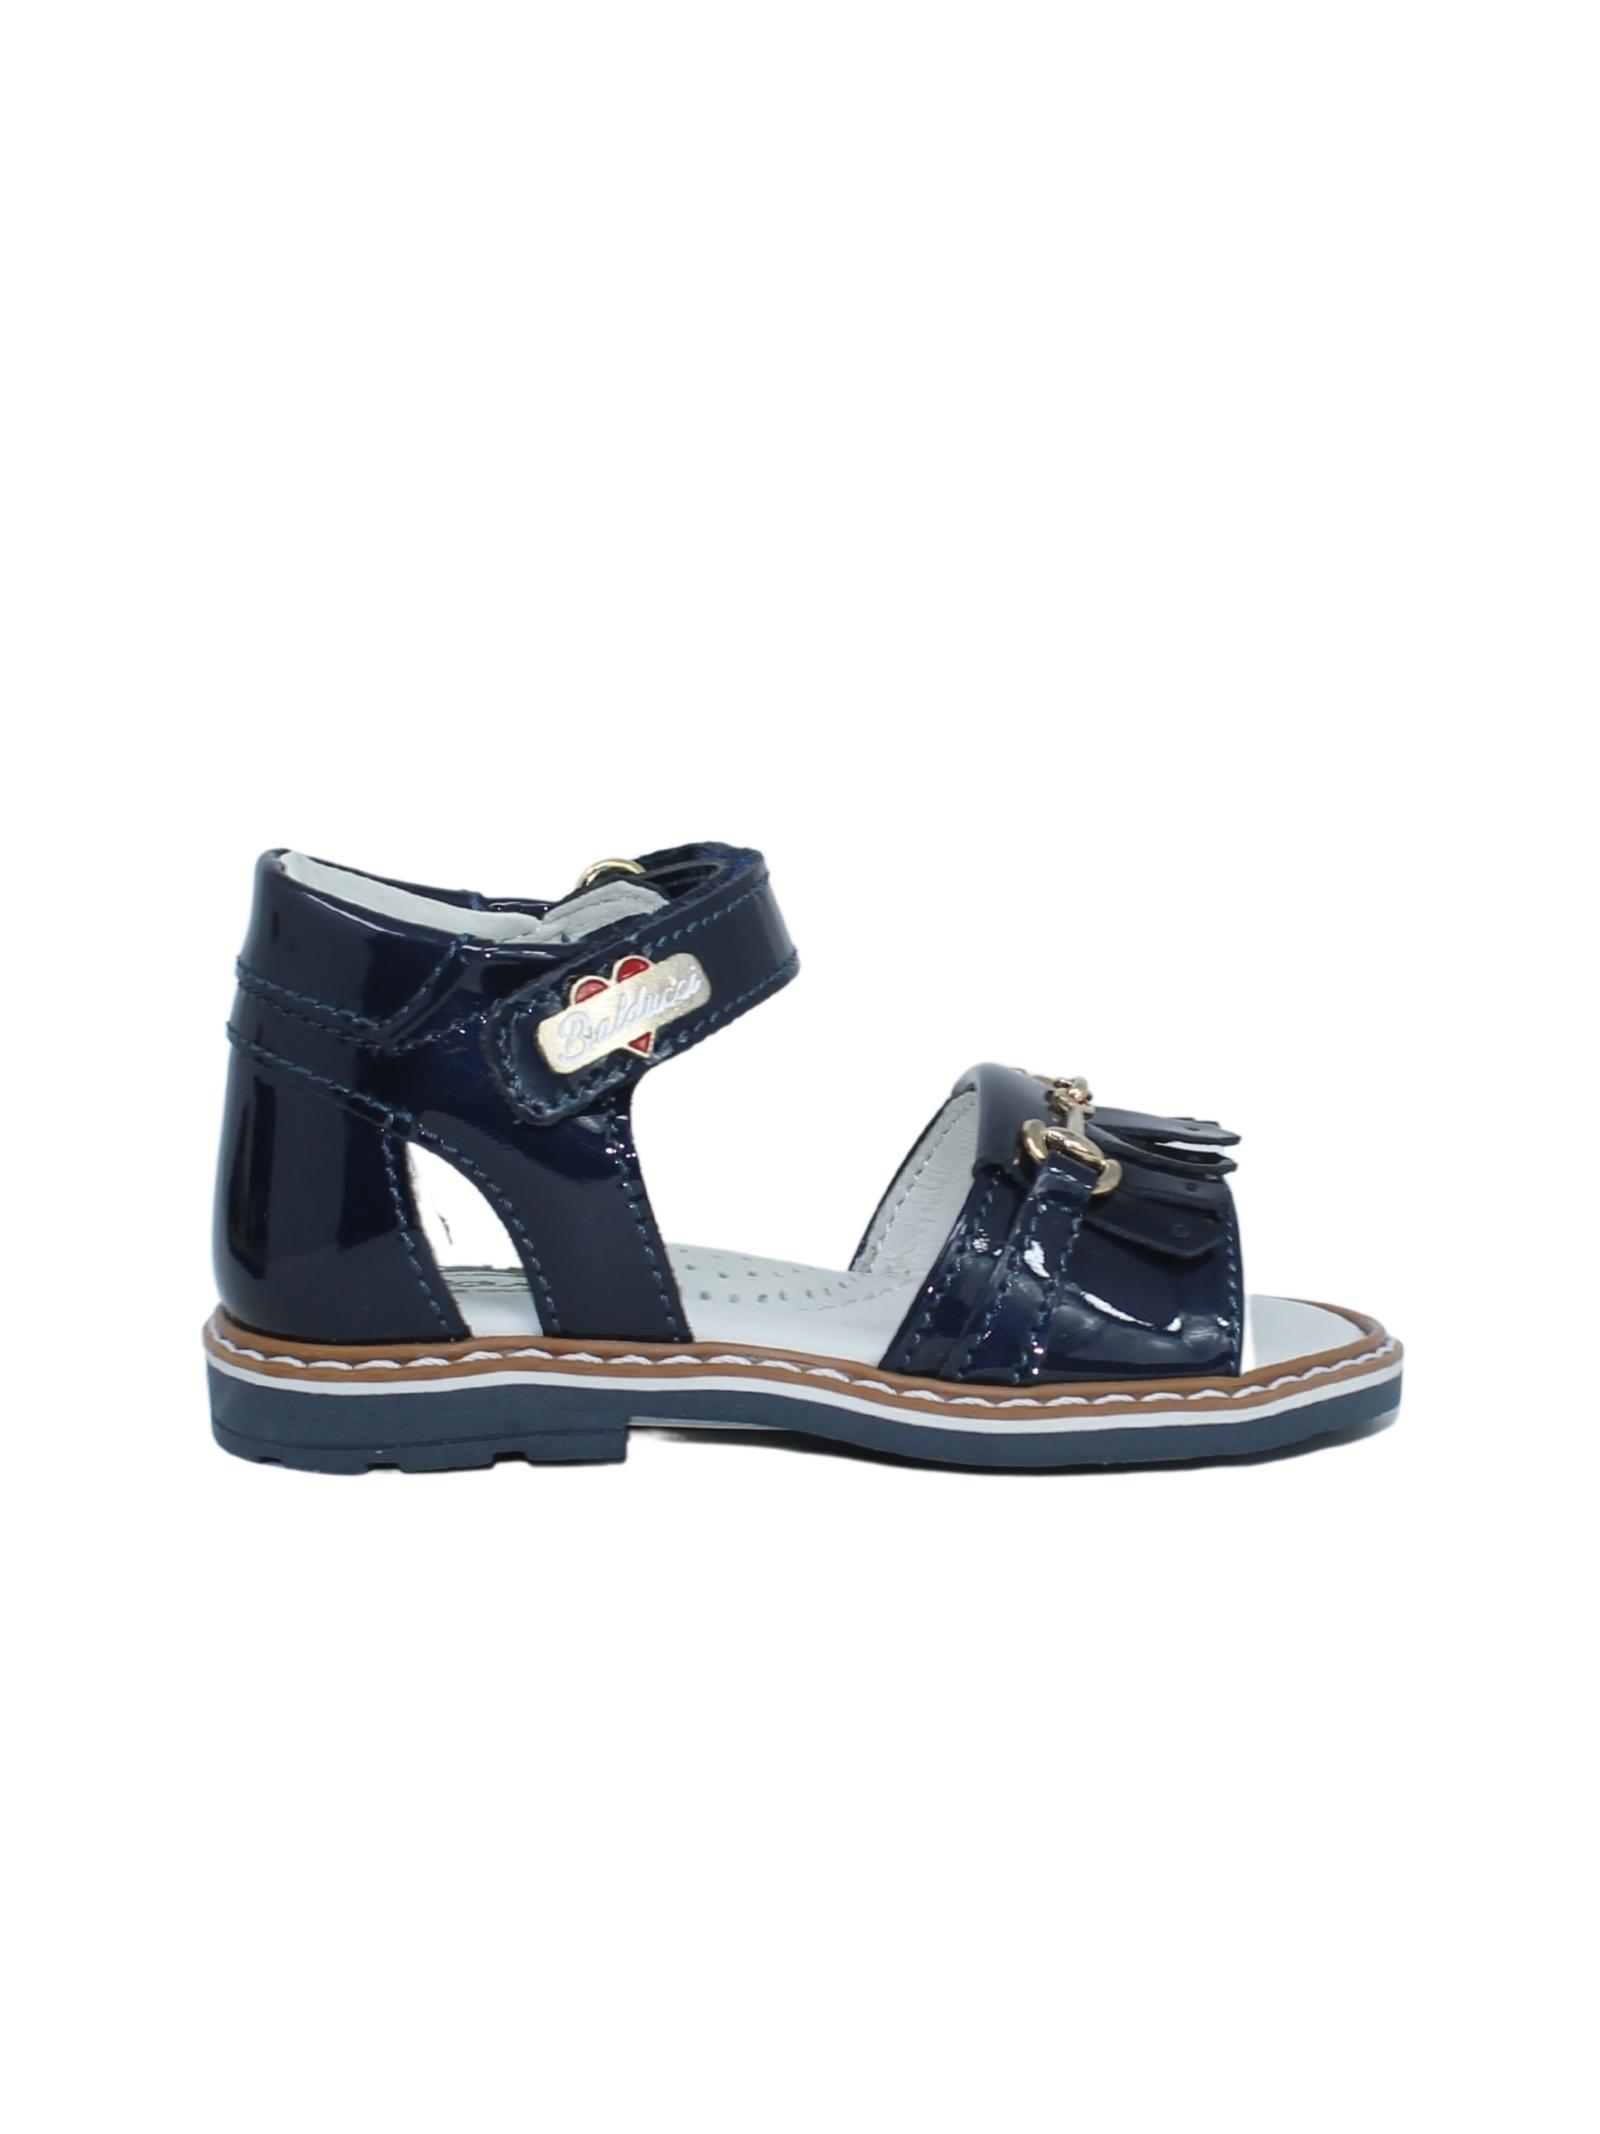 BALDUCCI | Sandals | 7413BLU